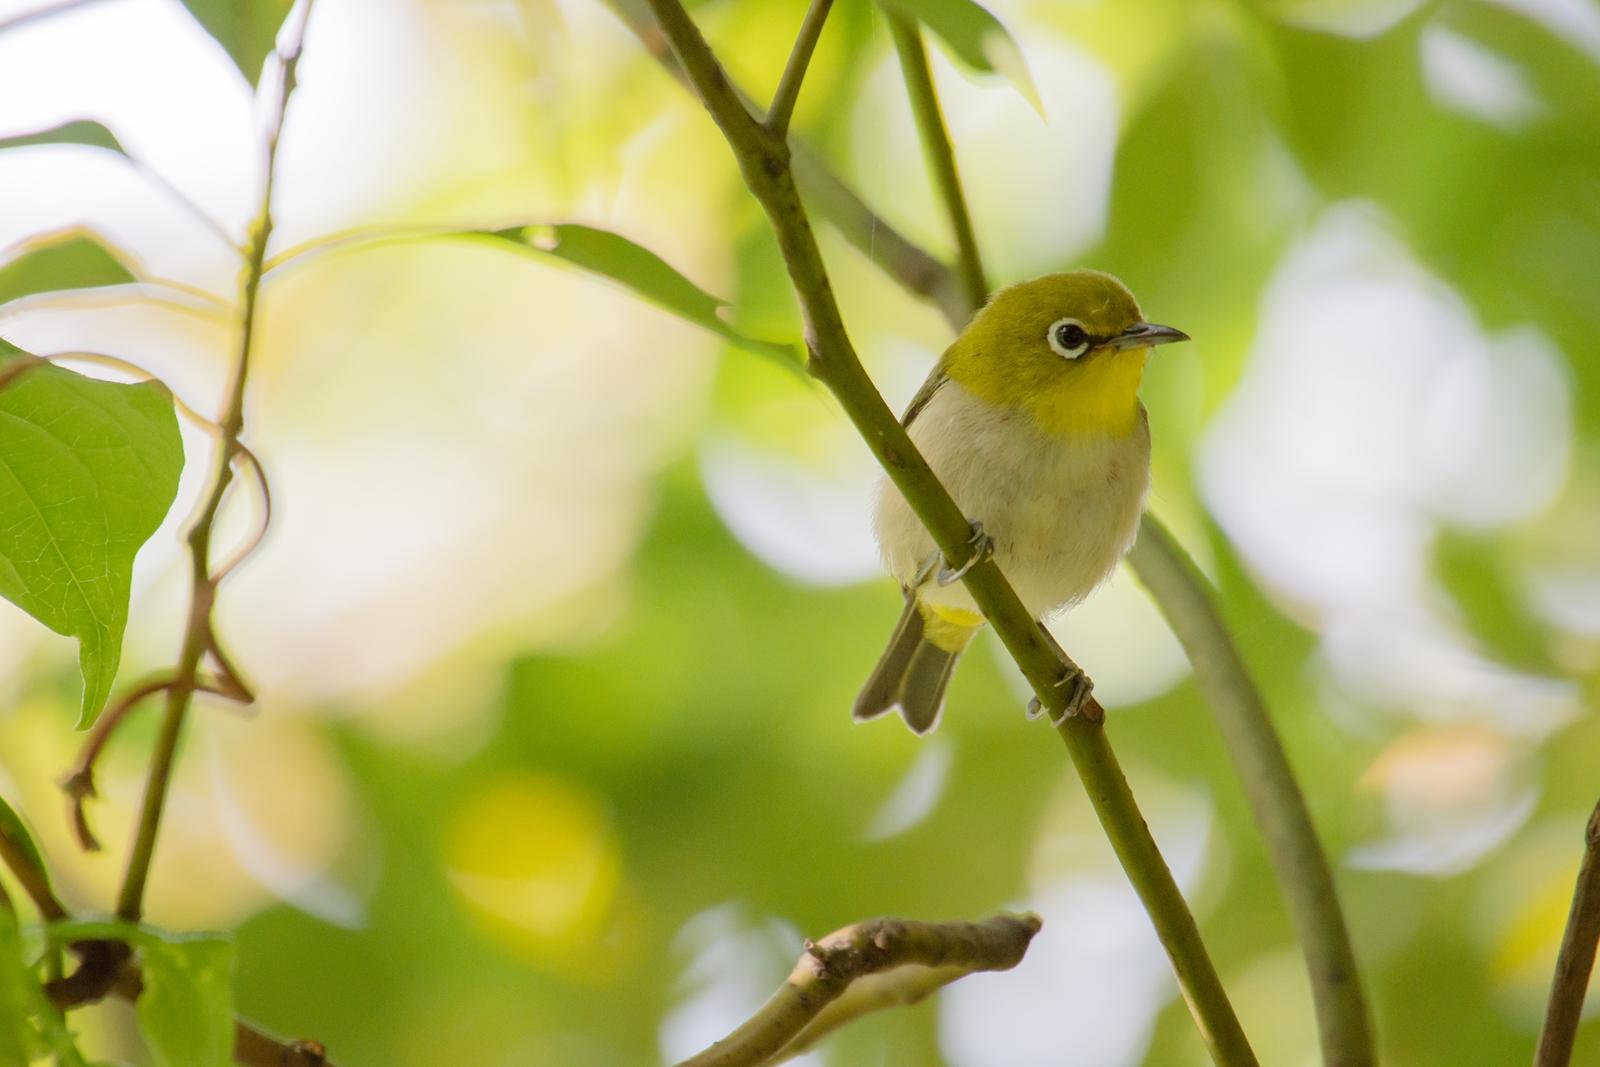 Photo: 緑に溶け込んで Blend into the green.  森は徐々に湿り気を帯び 葉が生い茂る 小さな住人達は 緑に溶け込みながら 遊ぶように飛び回る  Japanese White-eye. (メジロ)  #birdphotography #birds  #cooljapan #kawaii  #nikon #sigma  Nikon D7200 SIGMA APO 50-500mm F5-6.3 DG OS HSM  ・小鳥の詩朗読 /poetry reading https://youtu.be/0NF9wz8rHvE?list=PL2YtHGm0-R3qVsaqvQe9OYdJFCkI98wzF